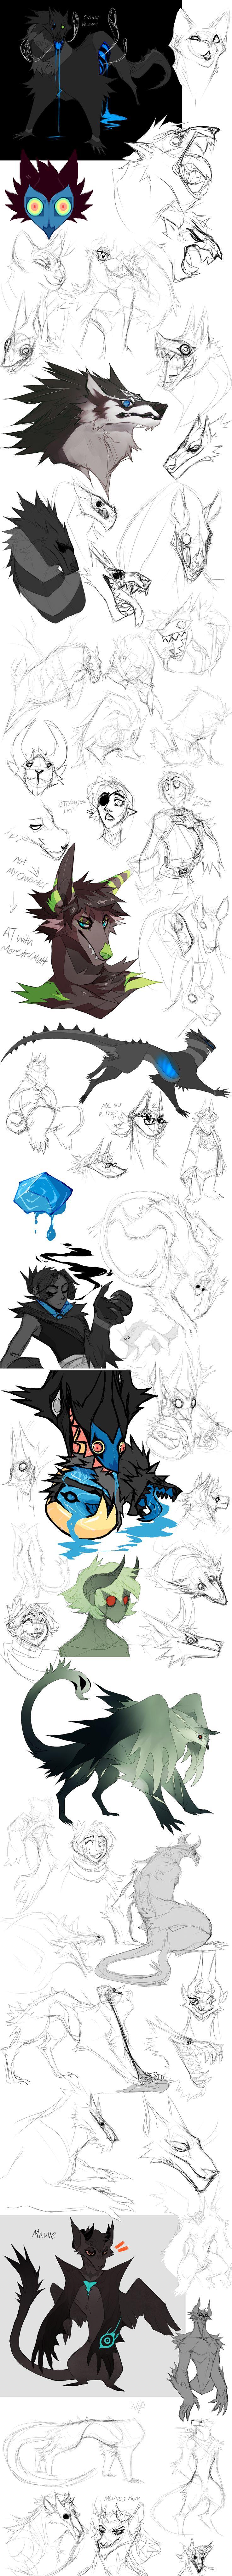 Sketch Dump no.17 by Dusty-Demon.deviantart.com on @DeviantArt